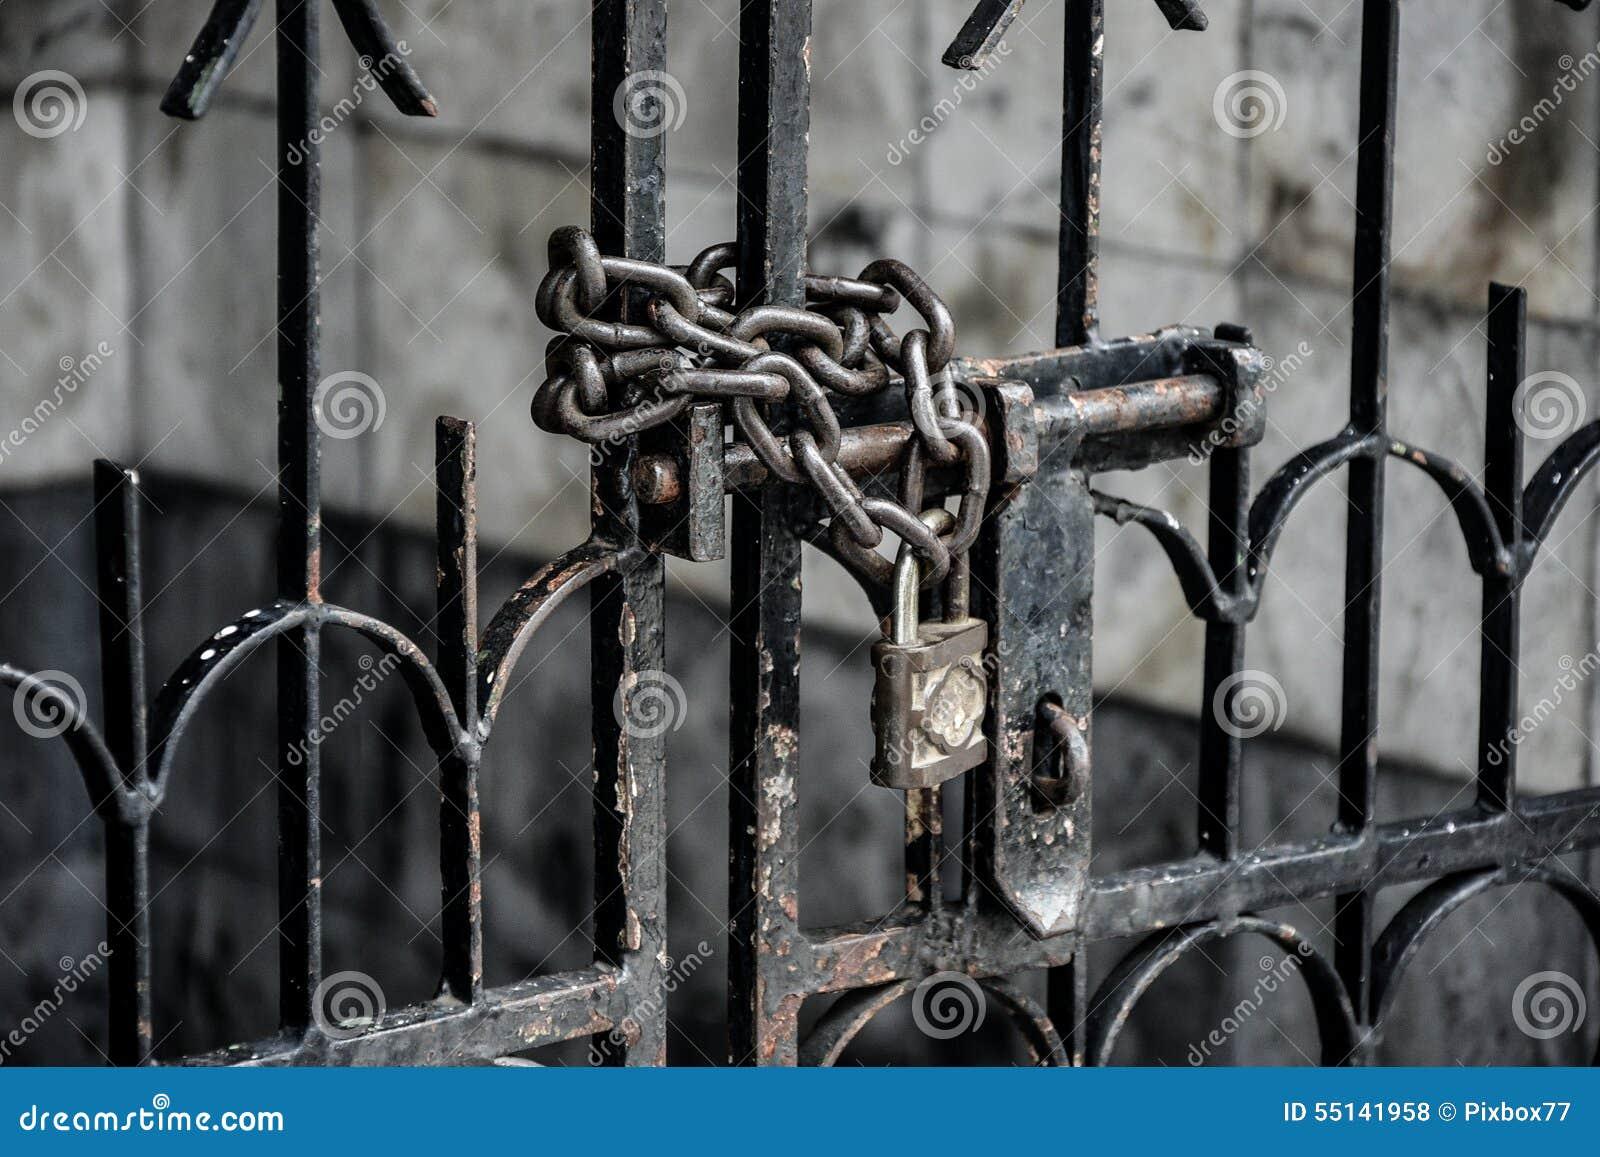 Verschlossene tür  Verschlossene Tür Stockfoto - Bild: 55141958